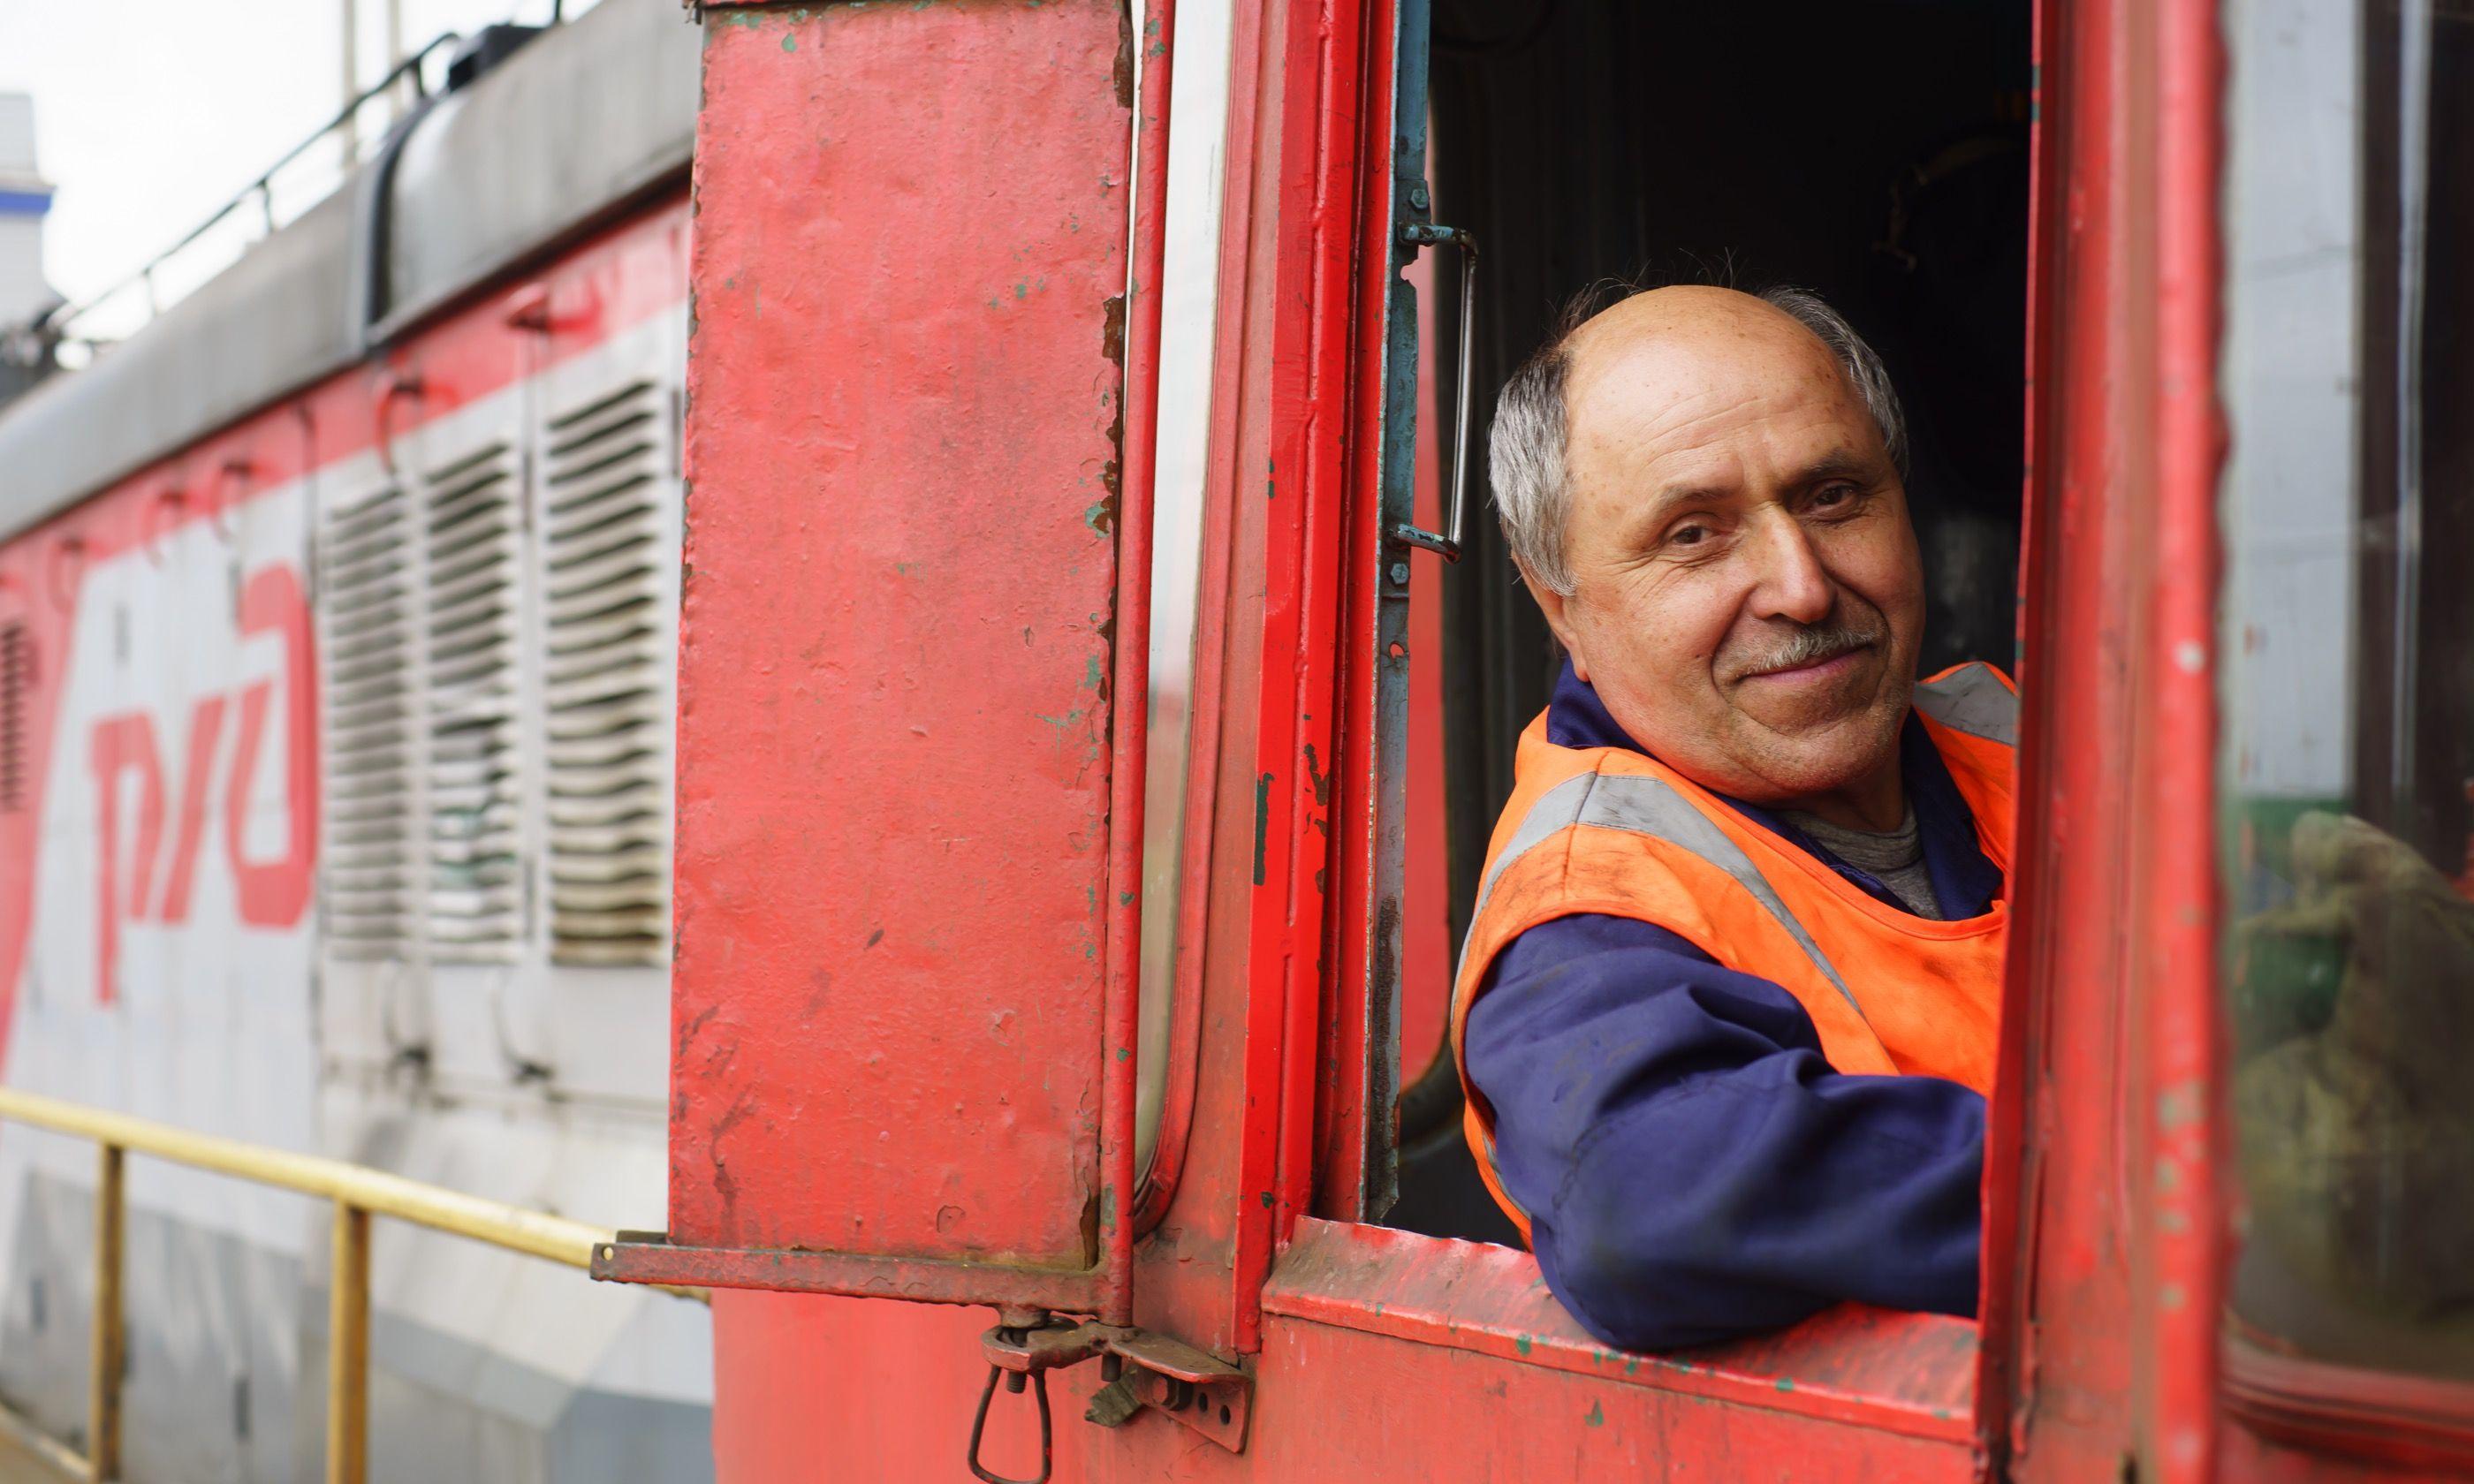 Russian train driver (Shutterstock.com)